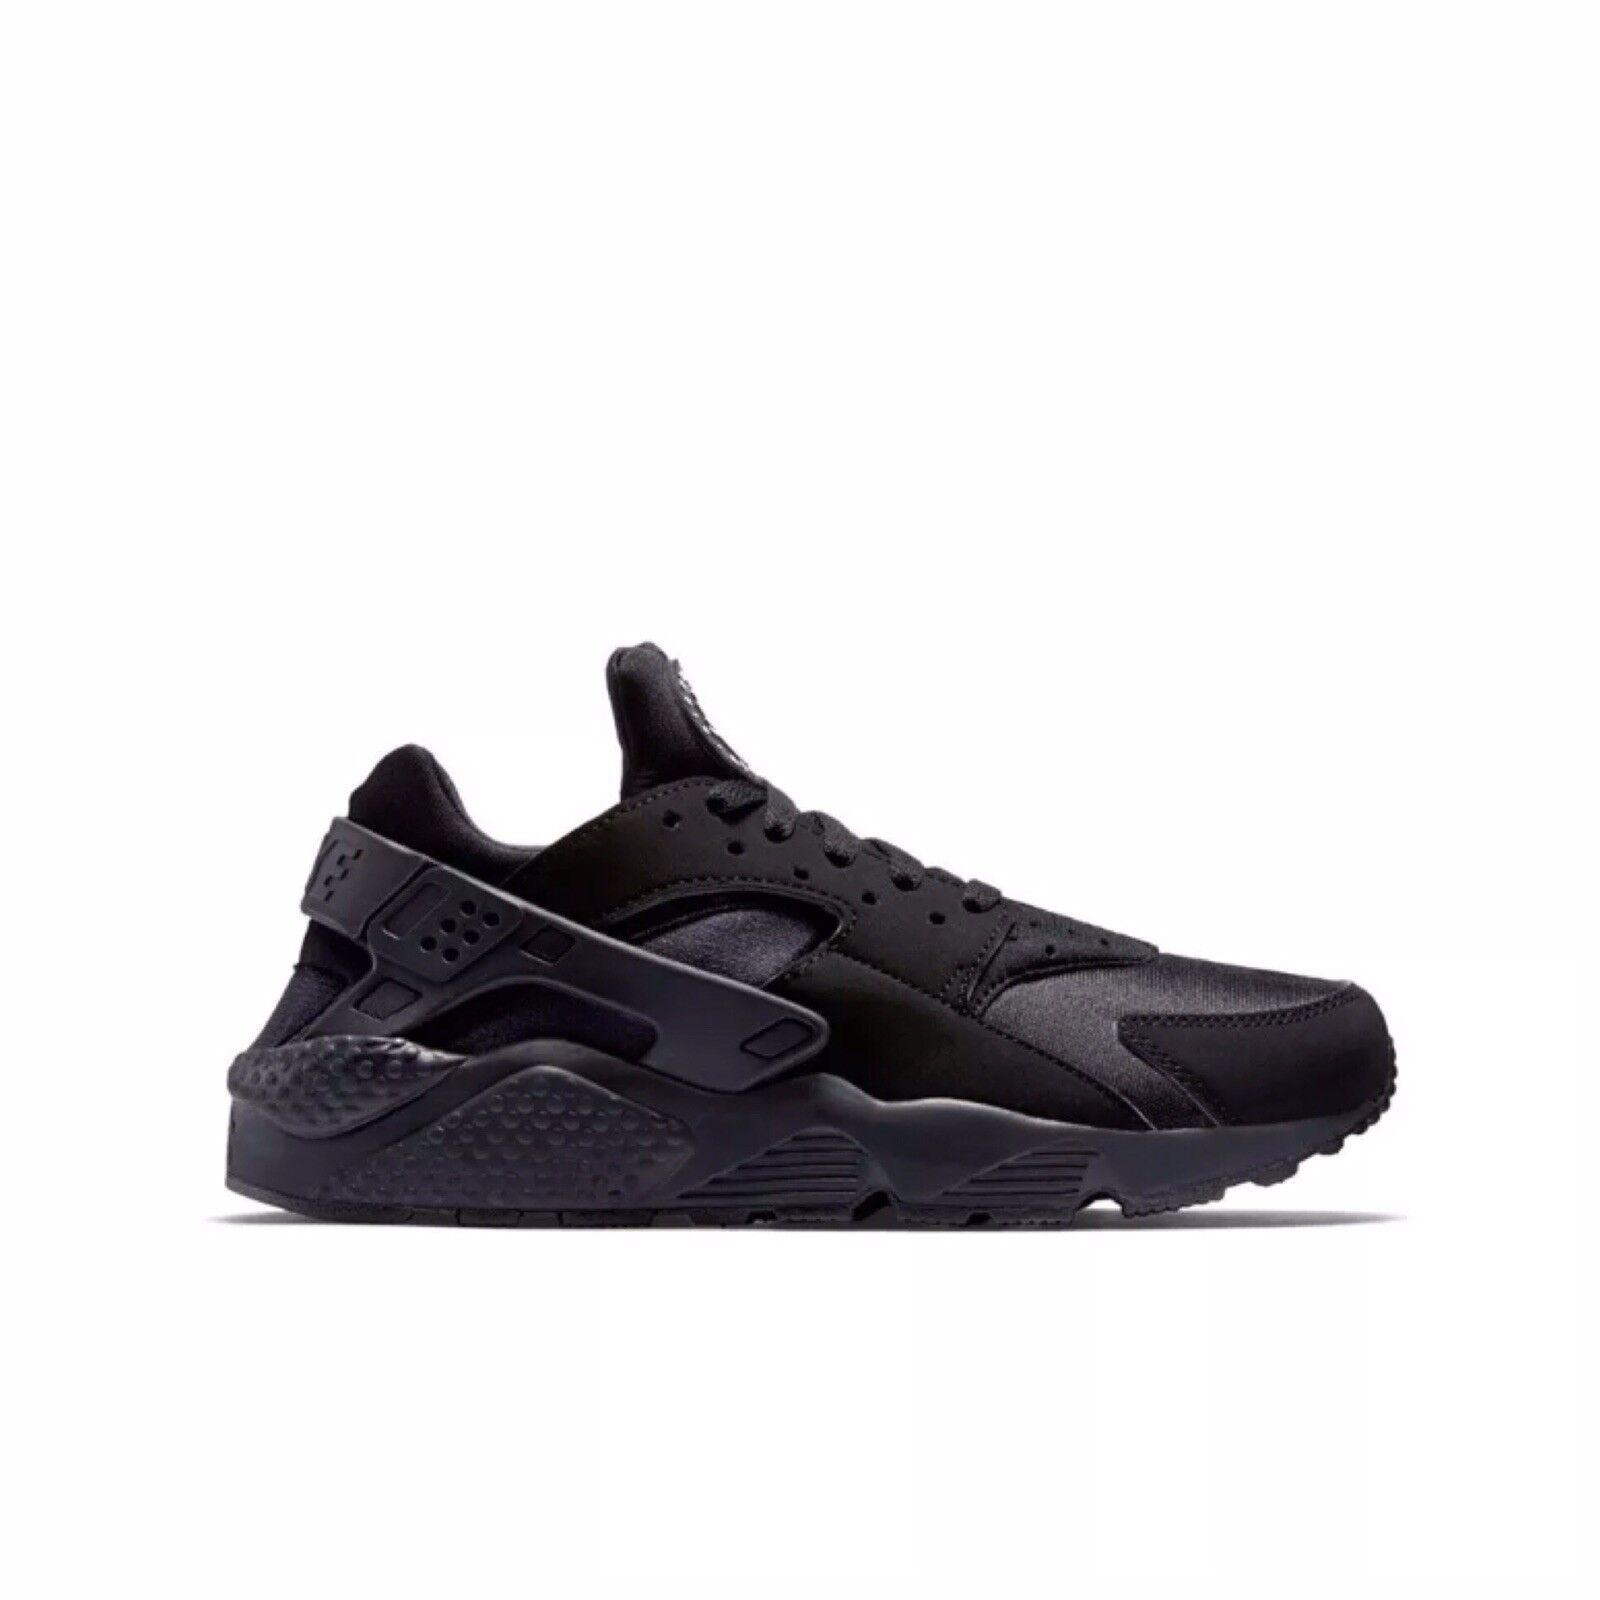 Nike Air Huarache Men's 318429-003 Black Athletic Running Training shoes Sz 10